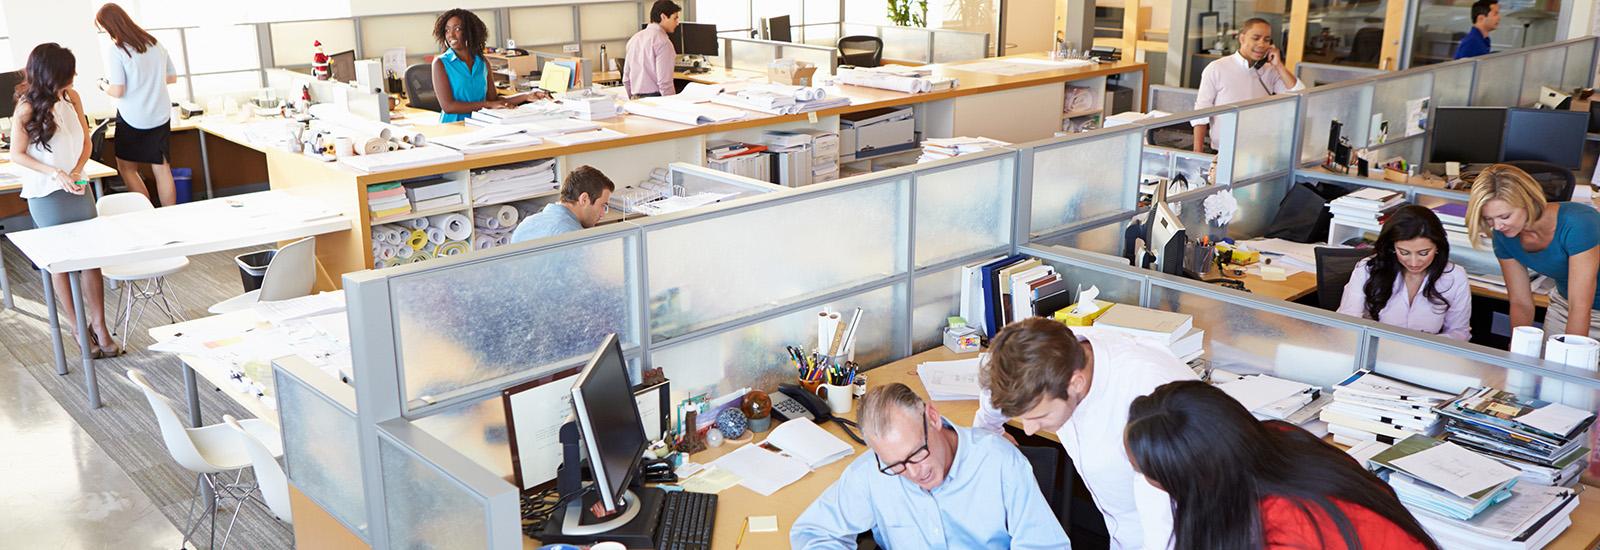 Outsource Payroll & Benefits